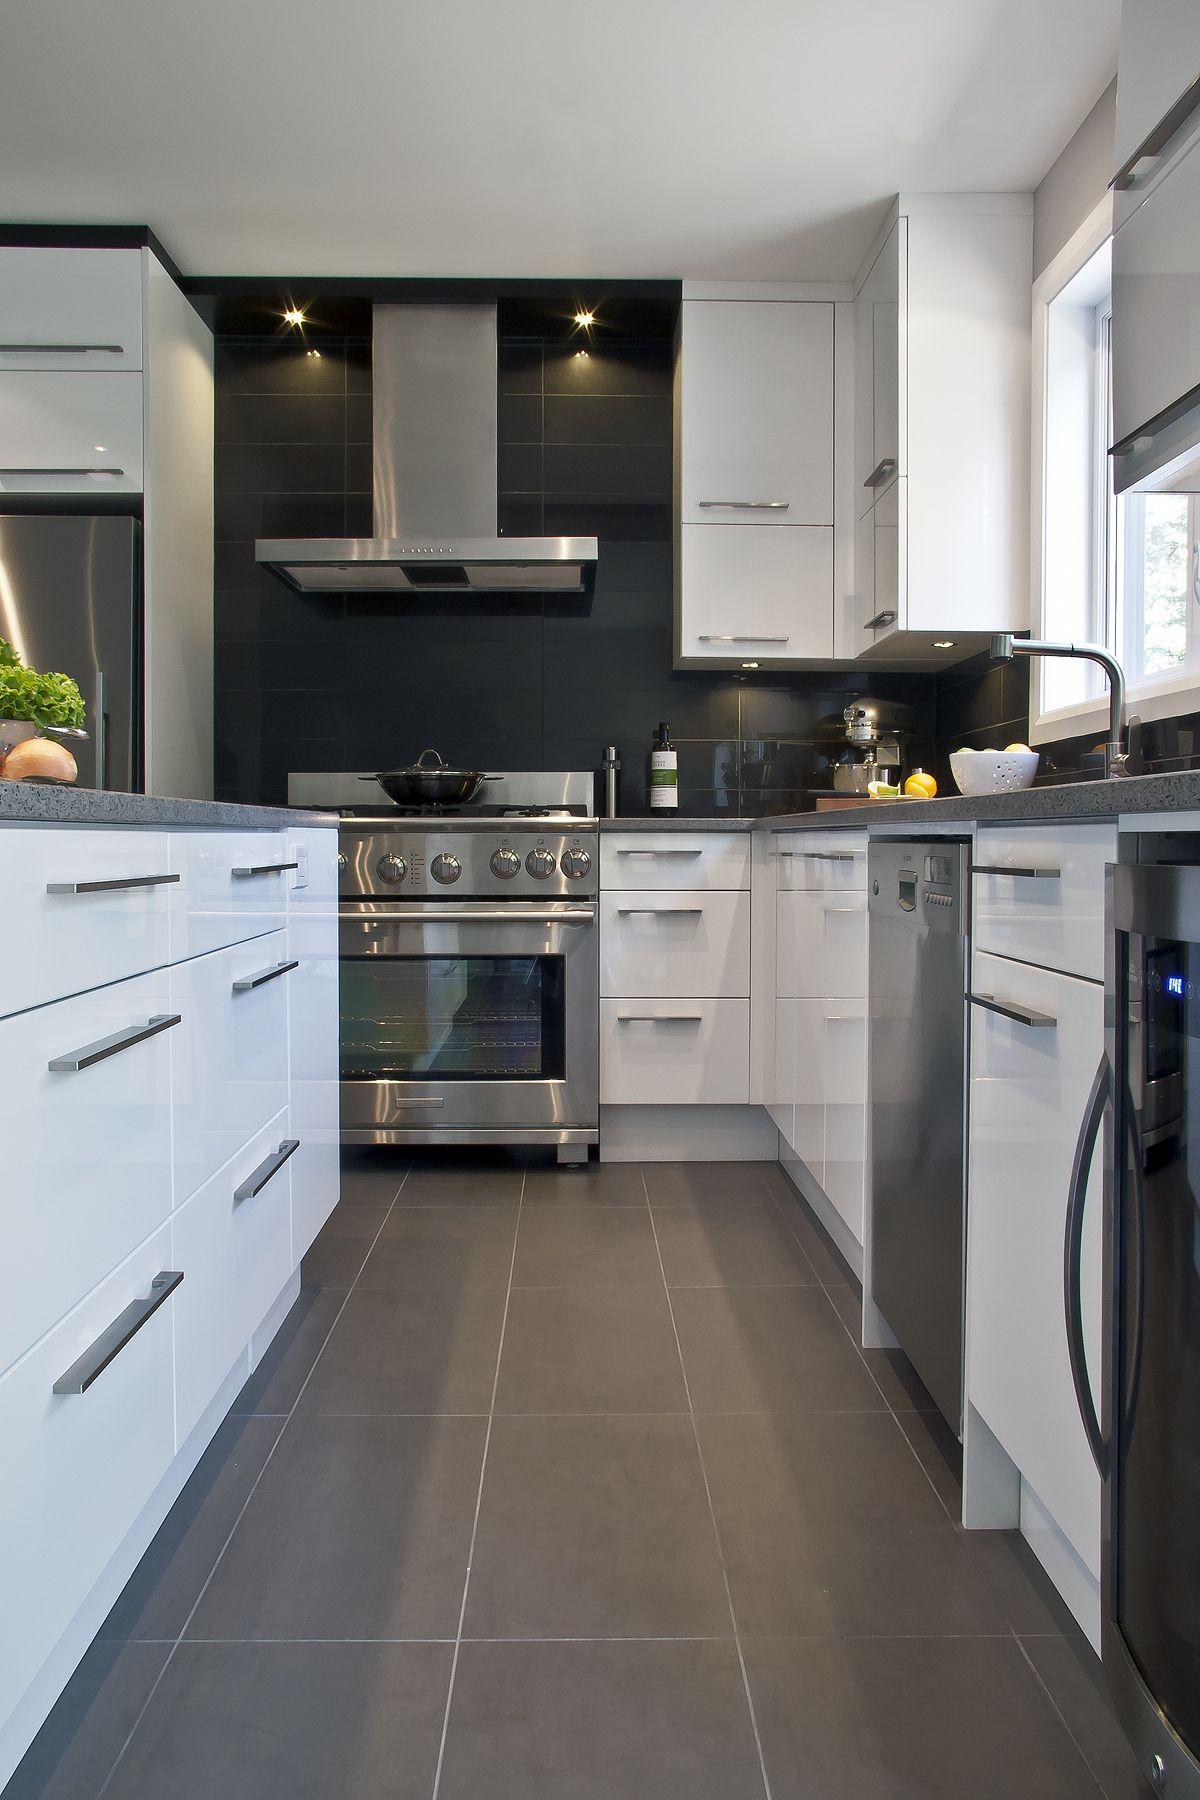 marque cuisine luxe cuisine haut de gamme cuisine moderne with cuisine haut de gamme allemande. Black Bedroom Furniture Sets. Home Design Ideas